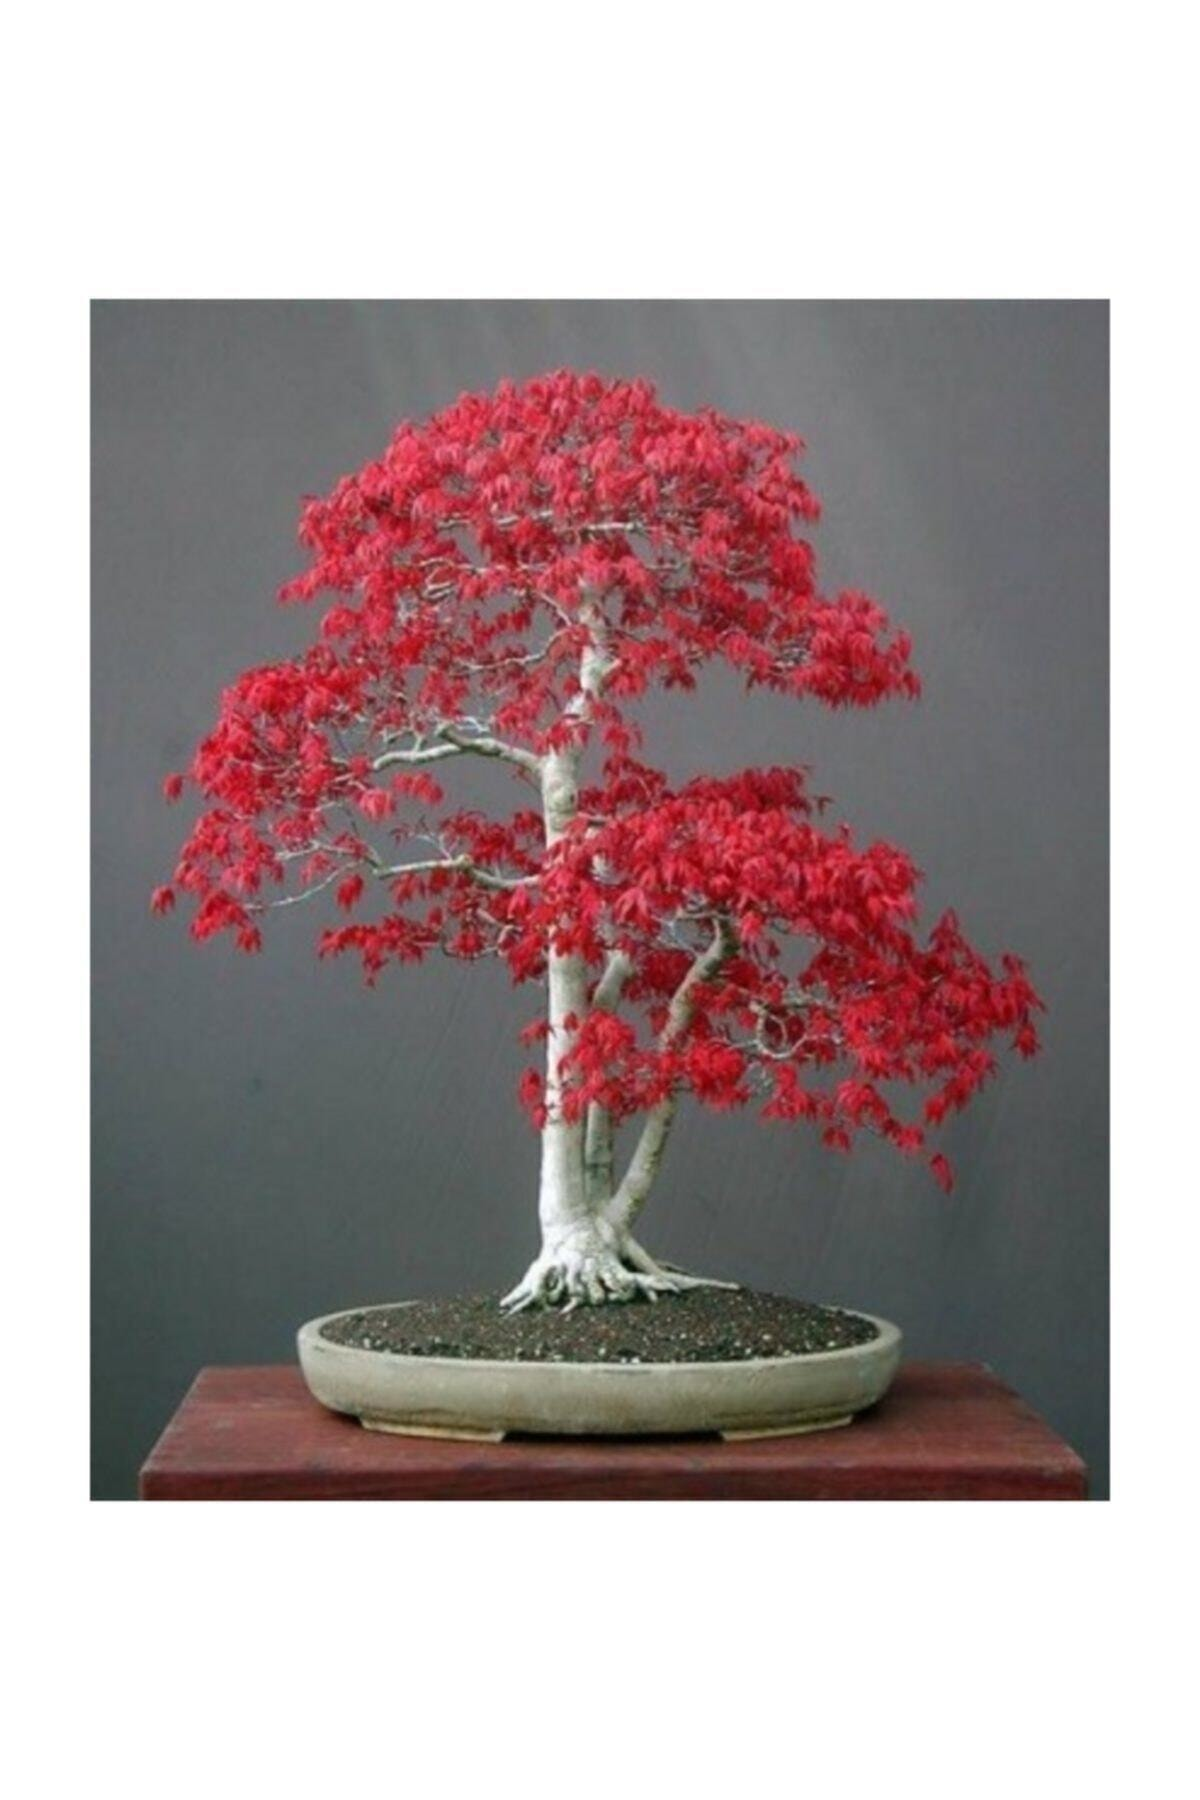 Bodur Acer Rubrum Bonzai Ağacı Tohumu 5 Adet Bonsai Ağacı Tohumu